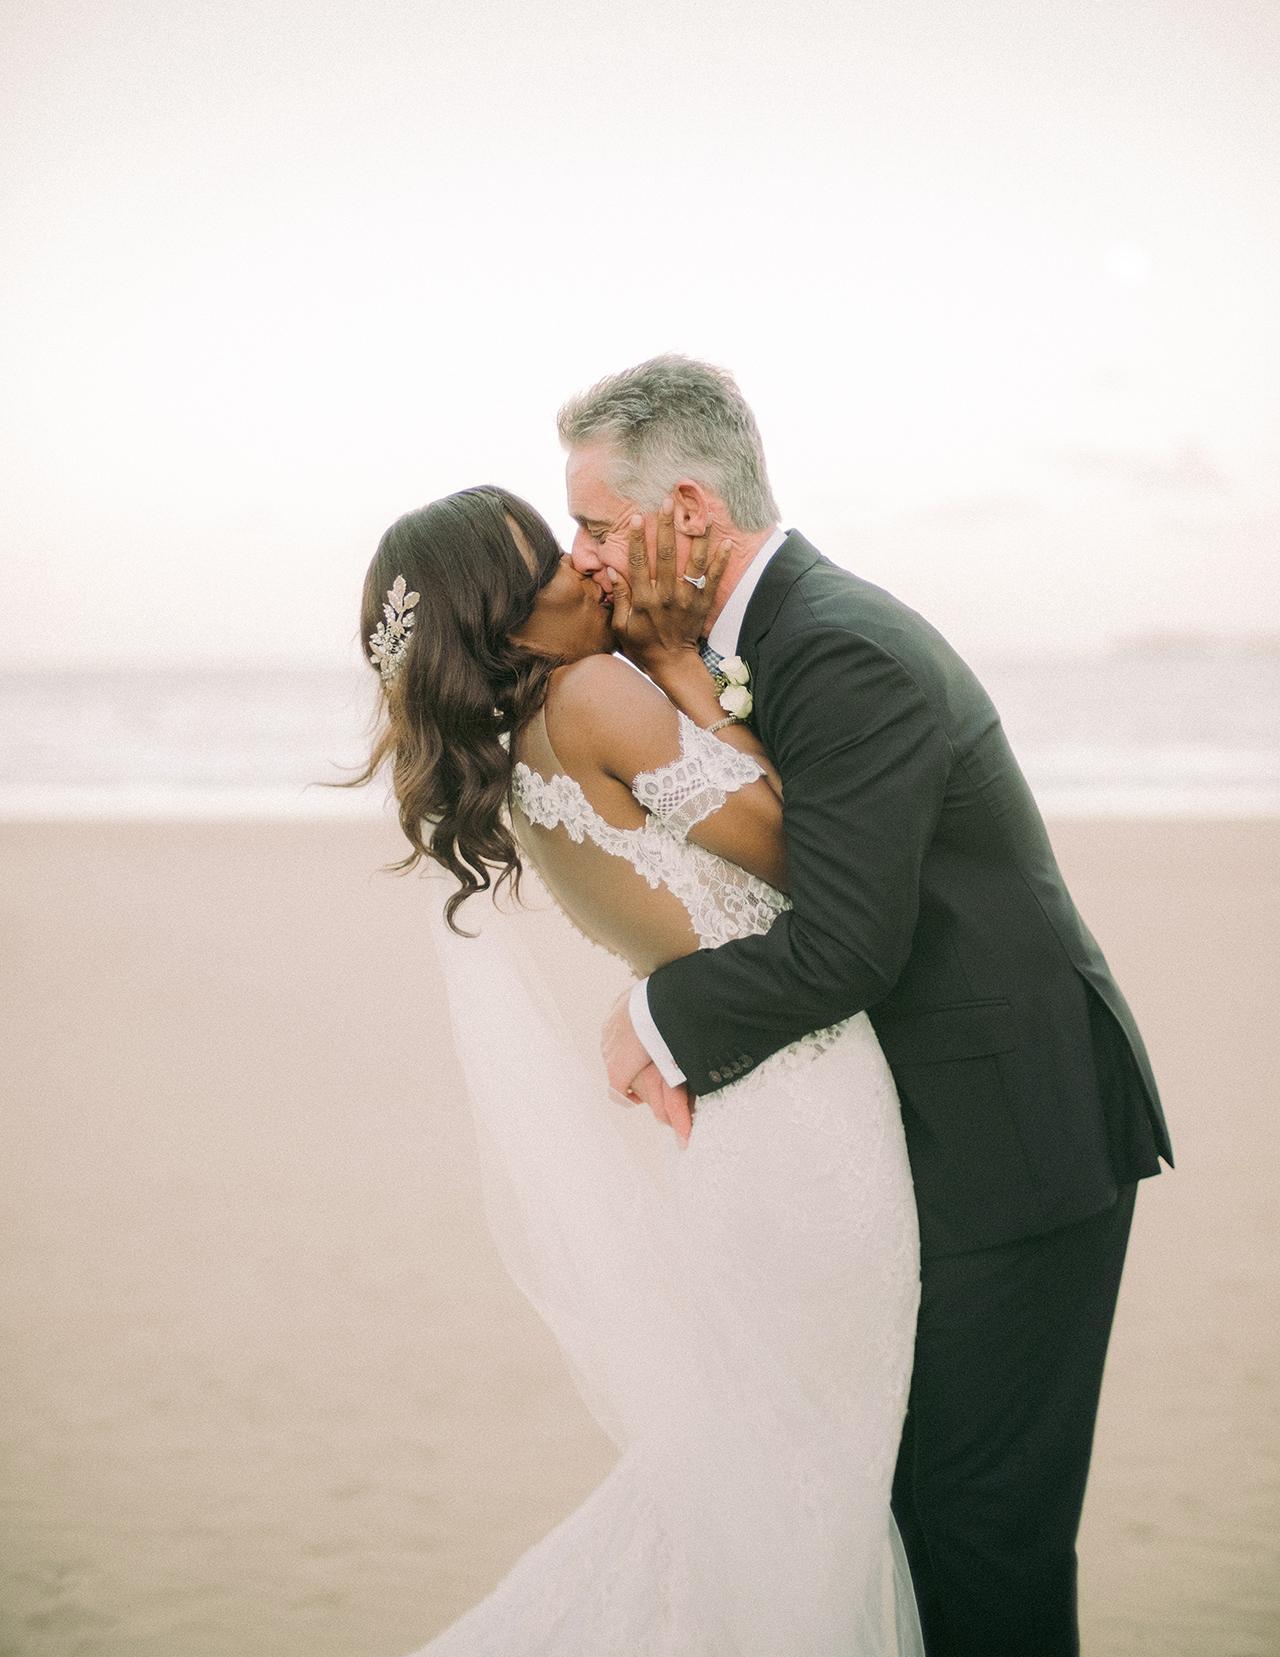 bride groom kiss on beach wedding attire